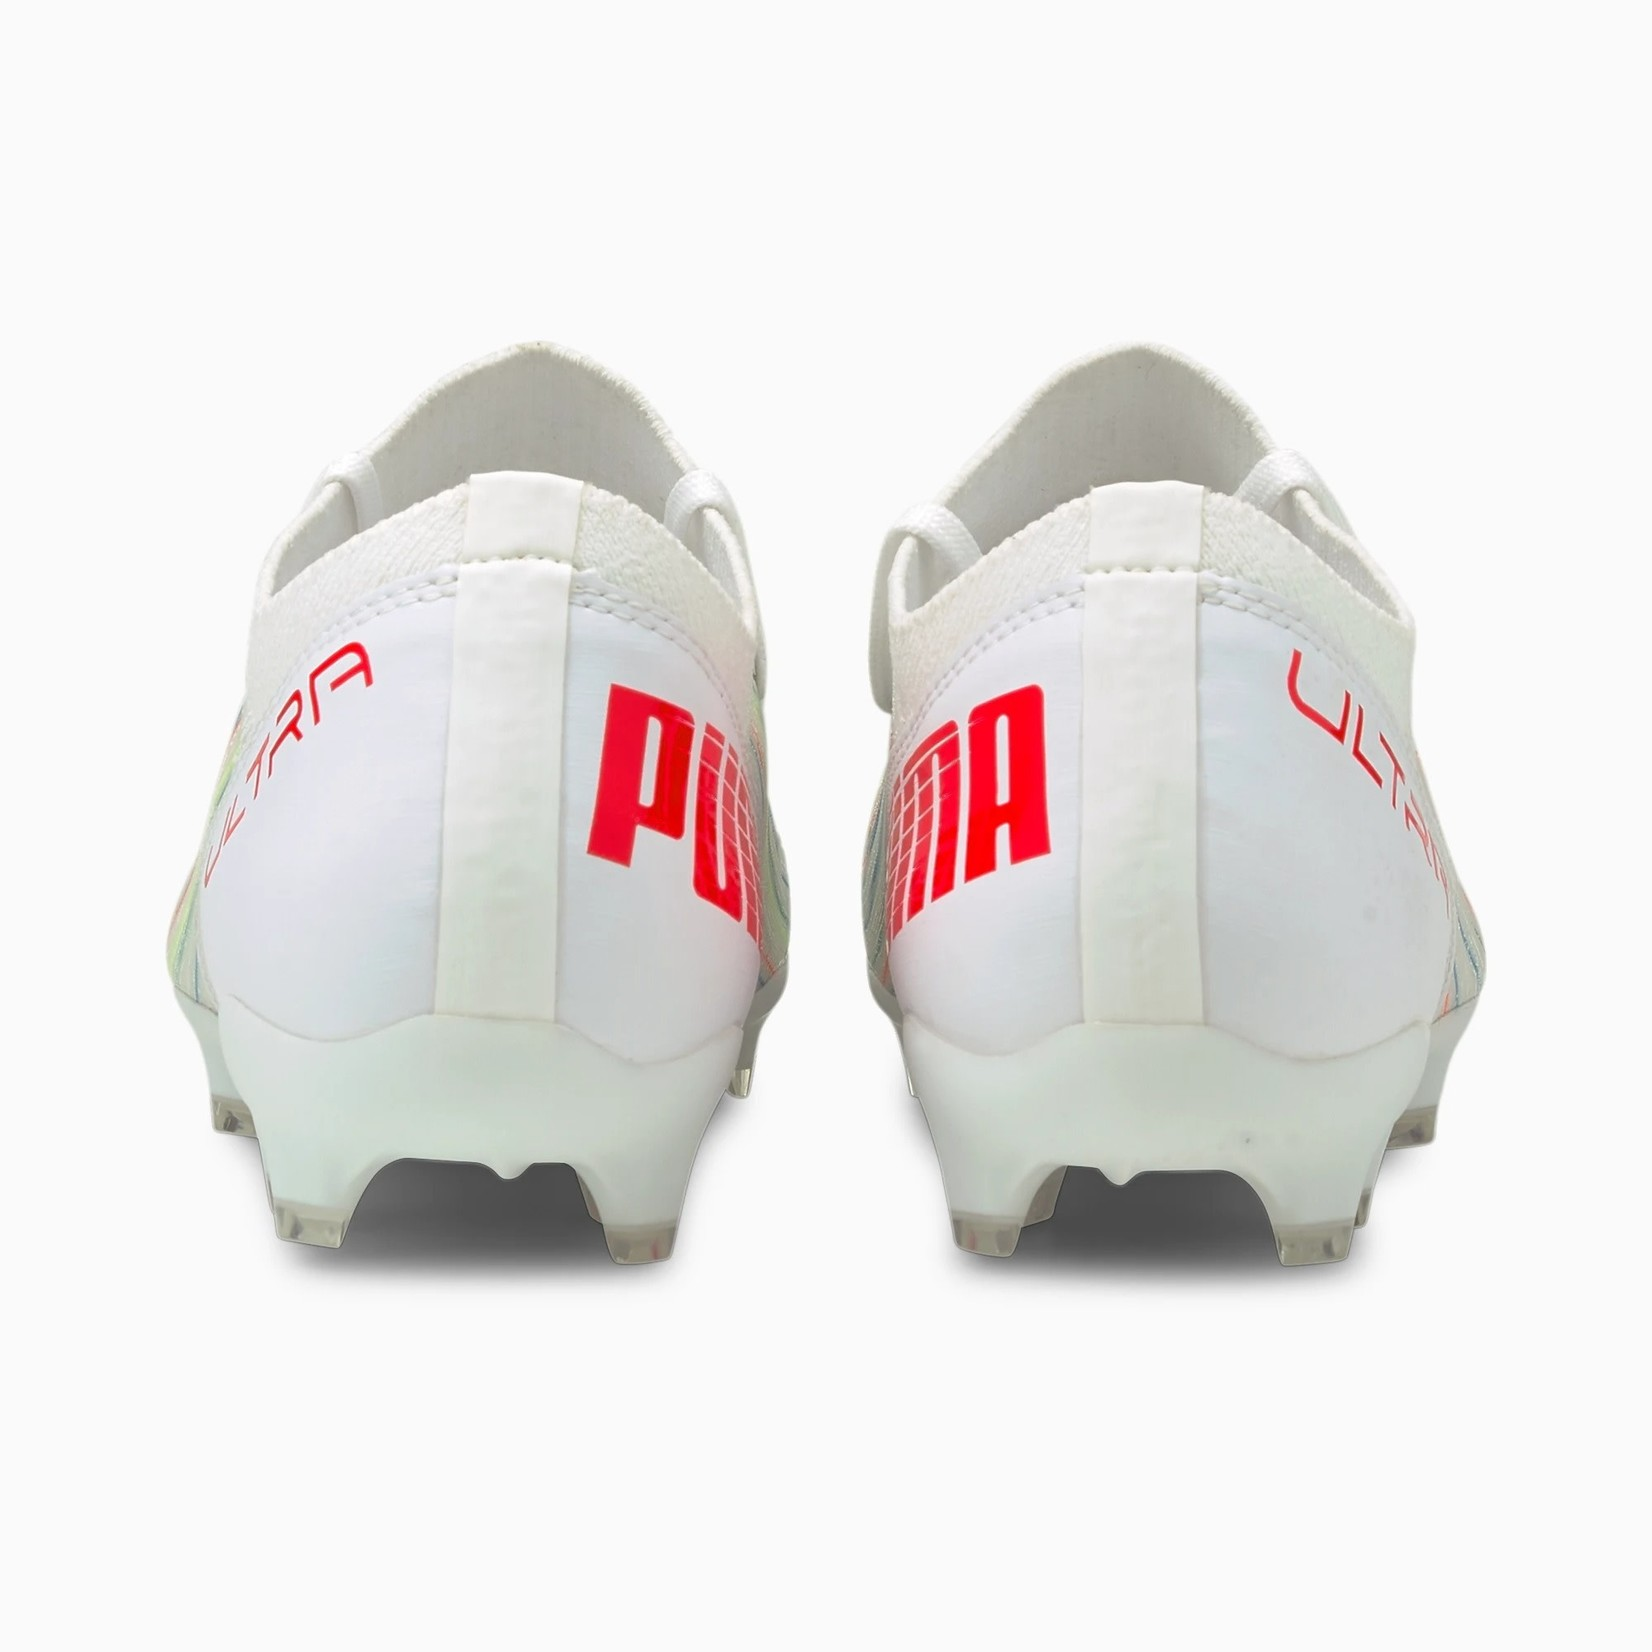 PUMA ULTRA 3.2 FG/AG JR (WHITE/MULTI)